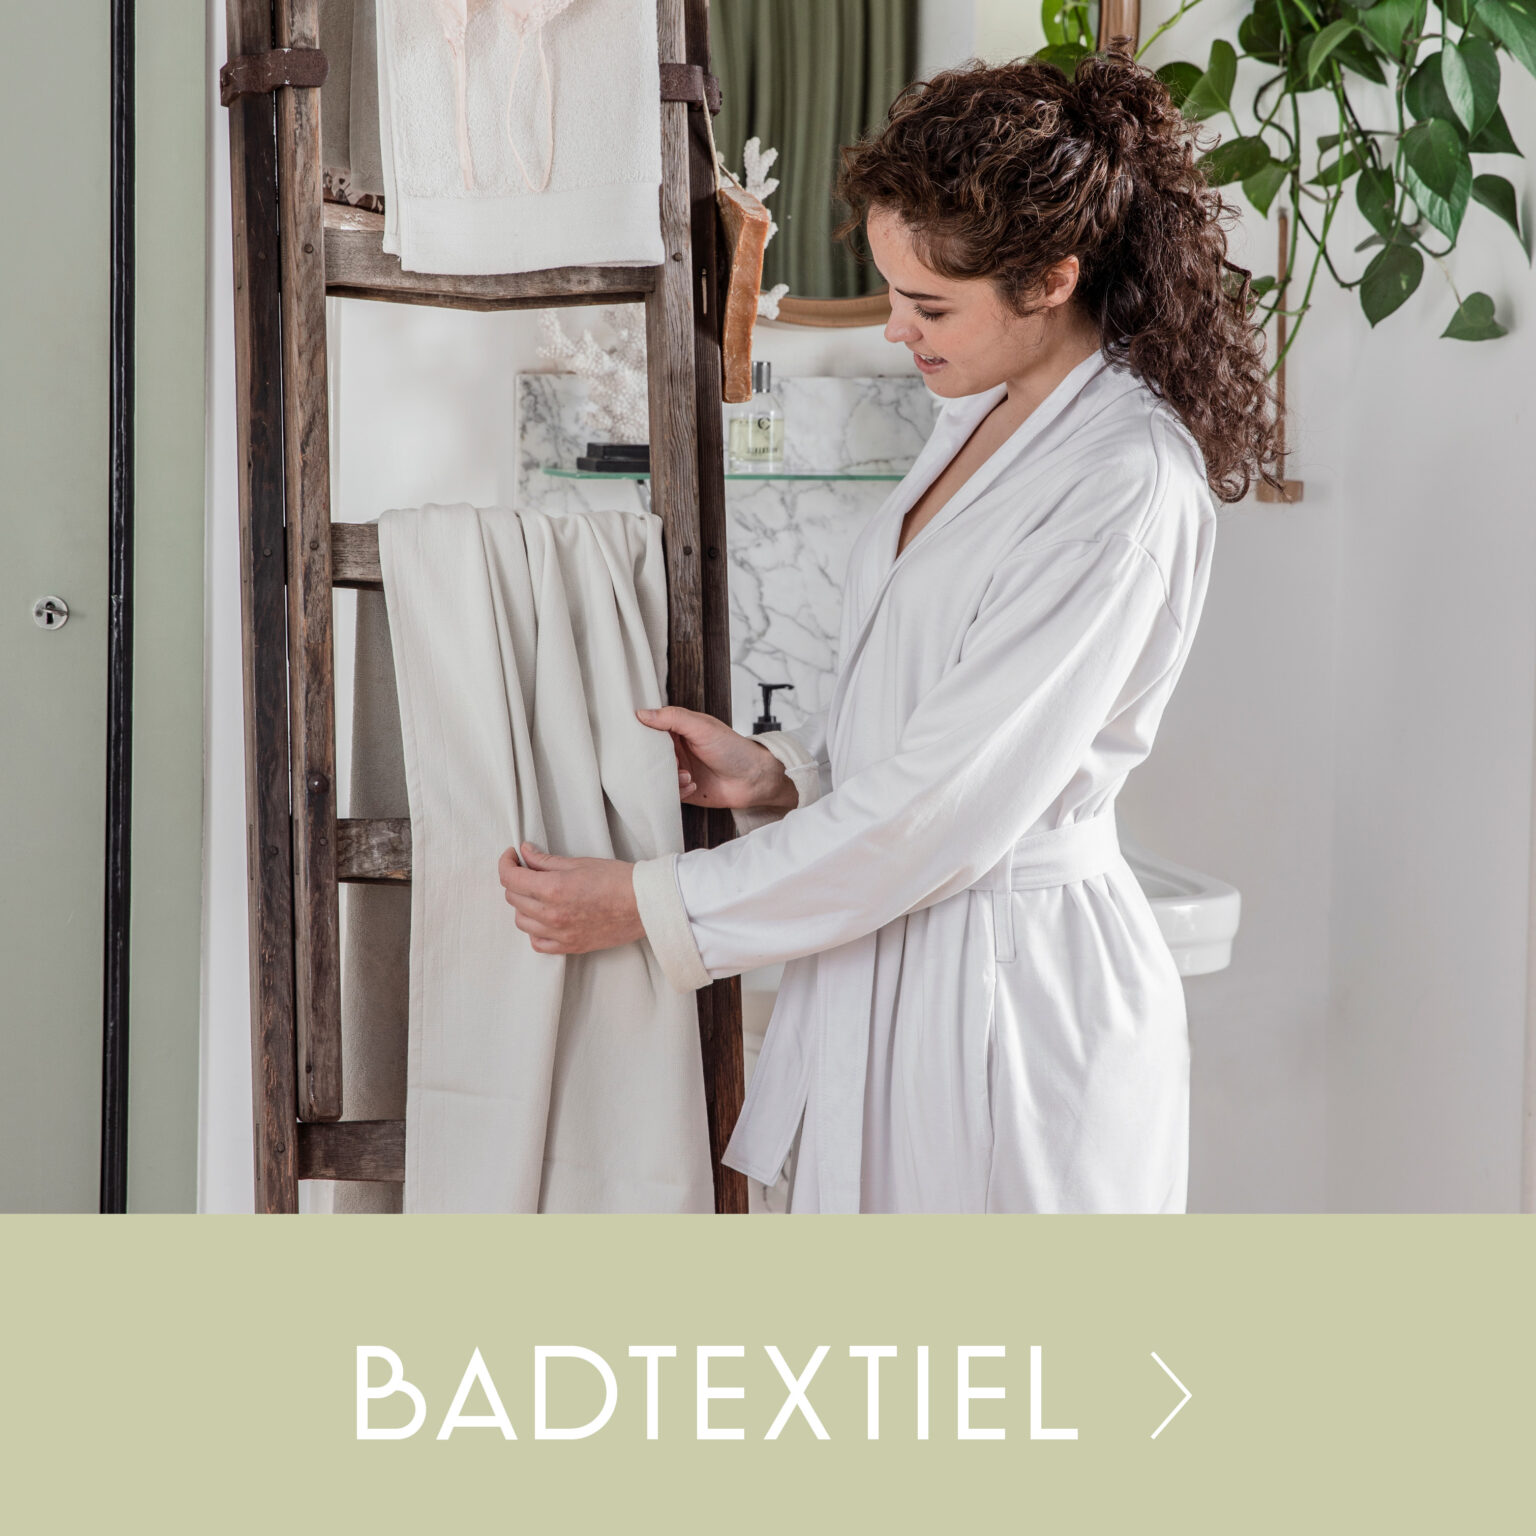 Badtextiel-badjassen-kopen